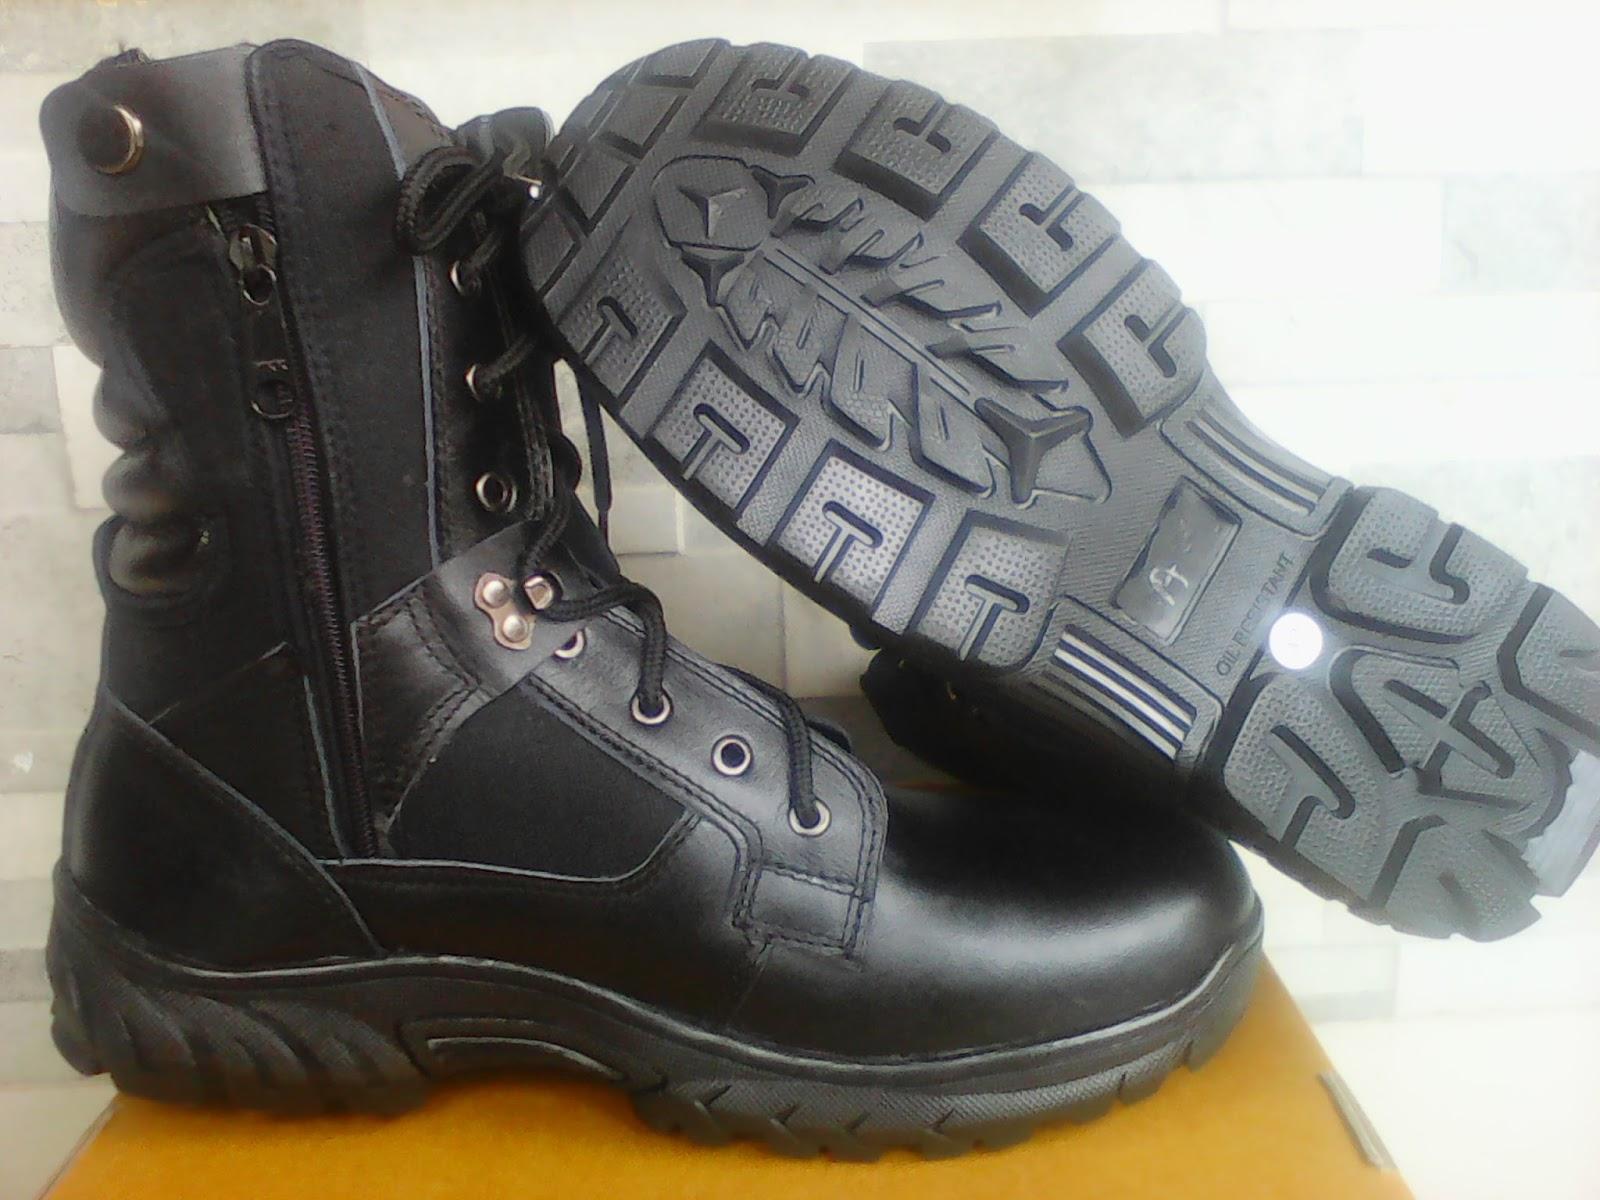 Harga Sepatu Pdh Tni Polri Dan Security Merk B2r Update Januari Tali Ressleting Mengkilap 2018 Zona Murah